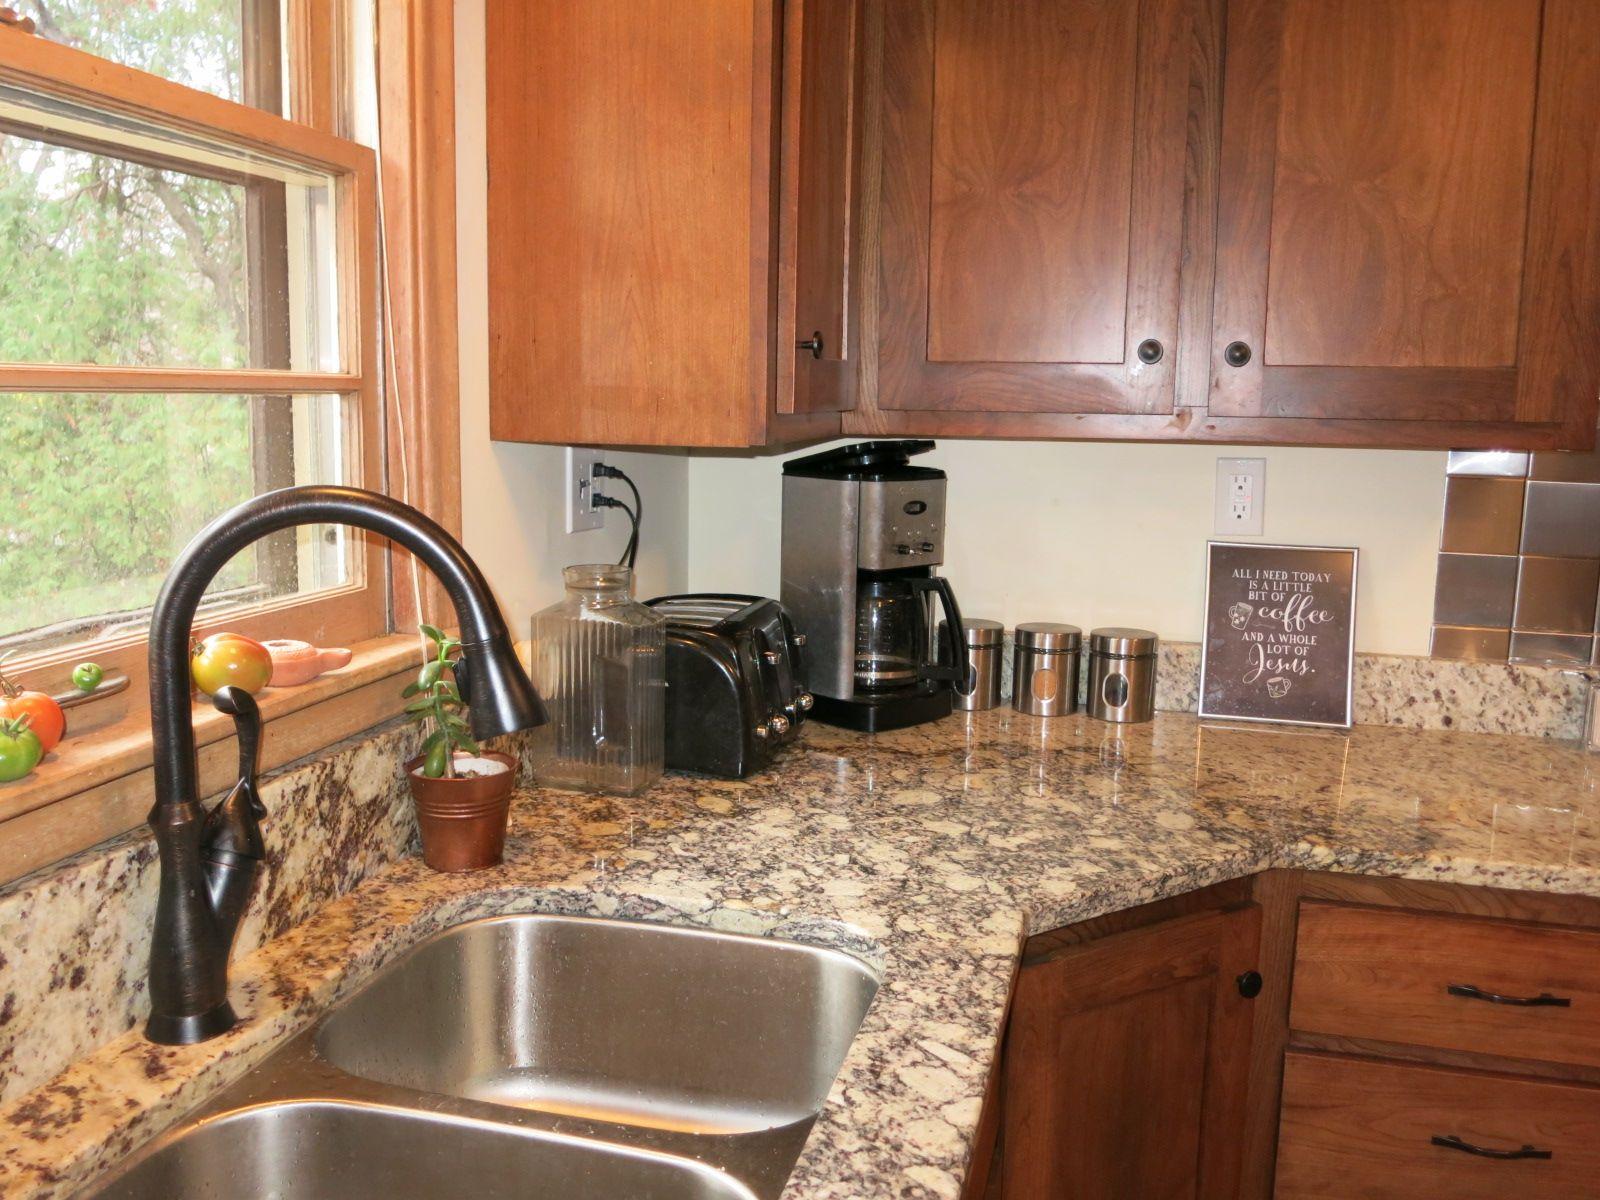 pullout faucet irregular santa cecilia granite cherry shaker